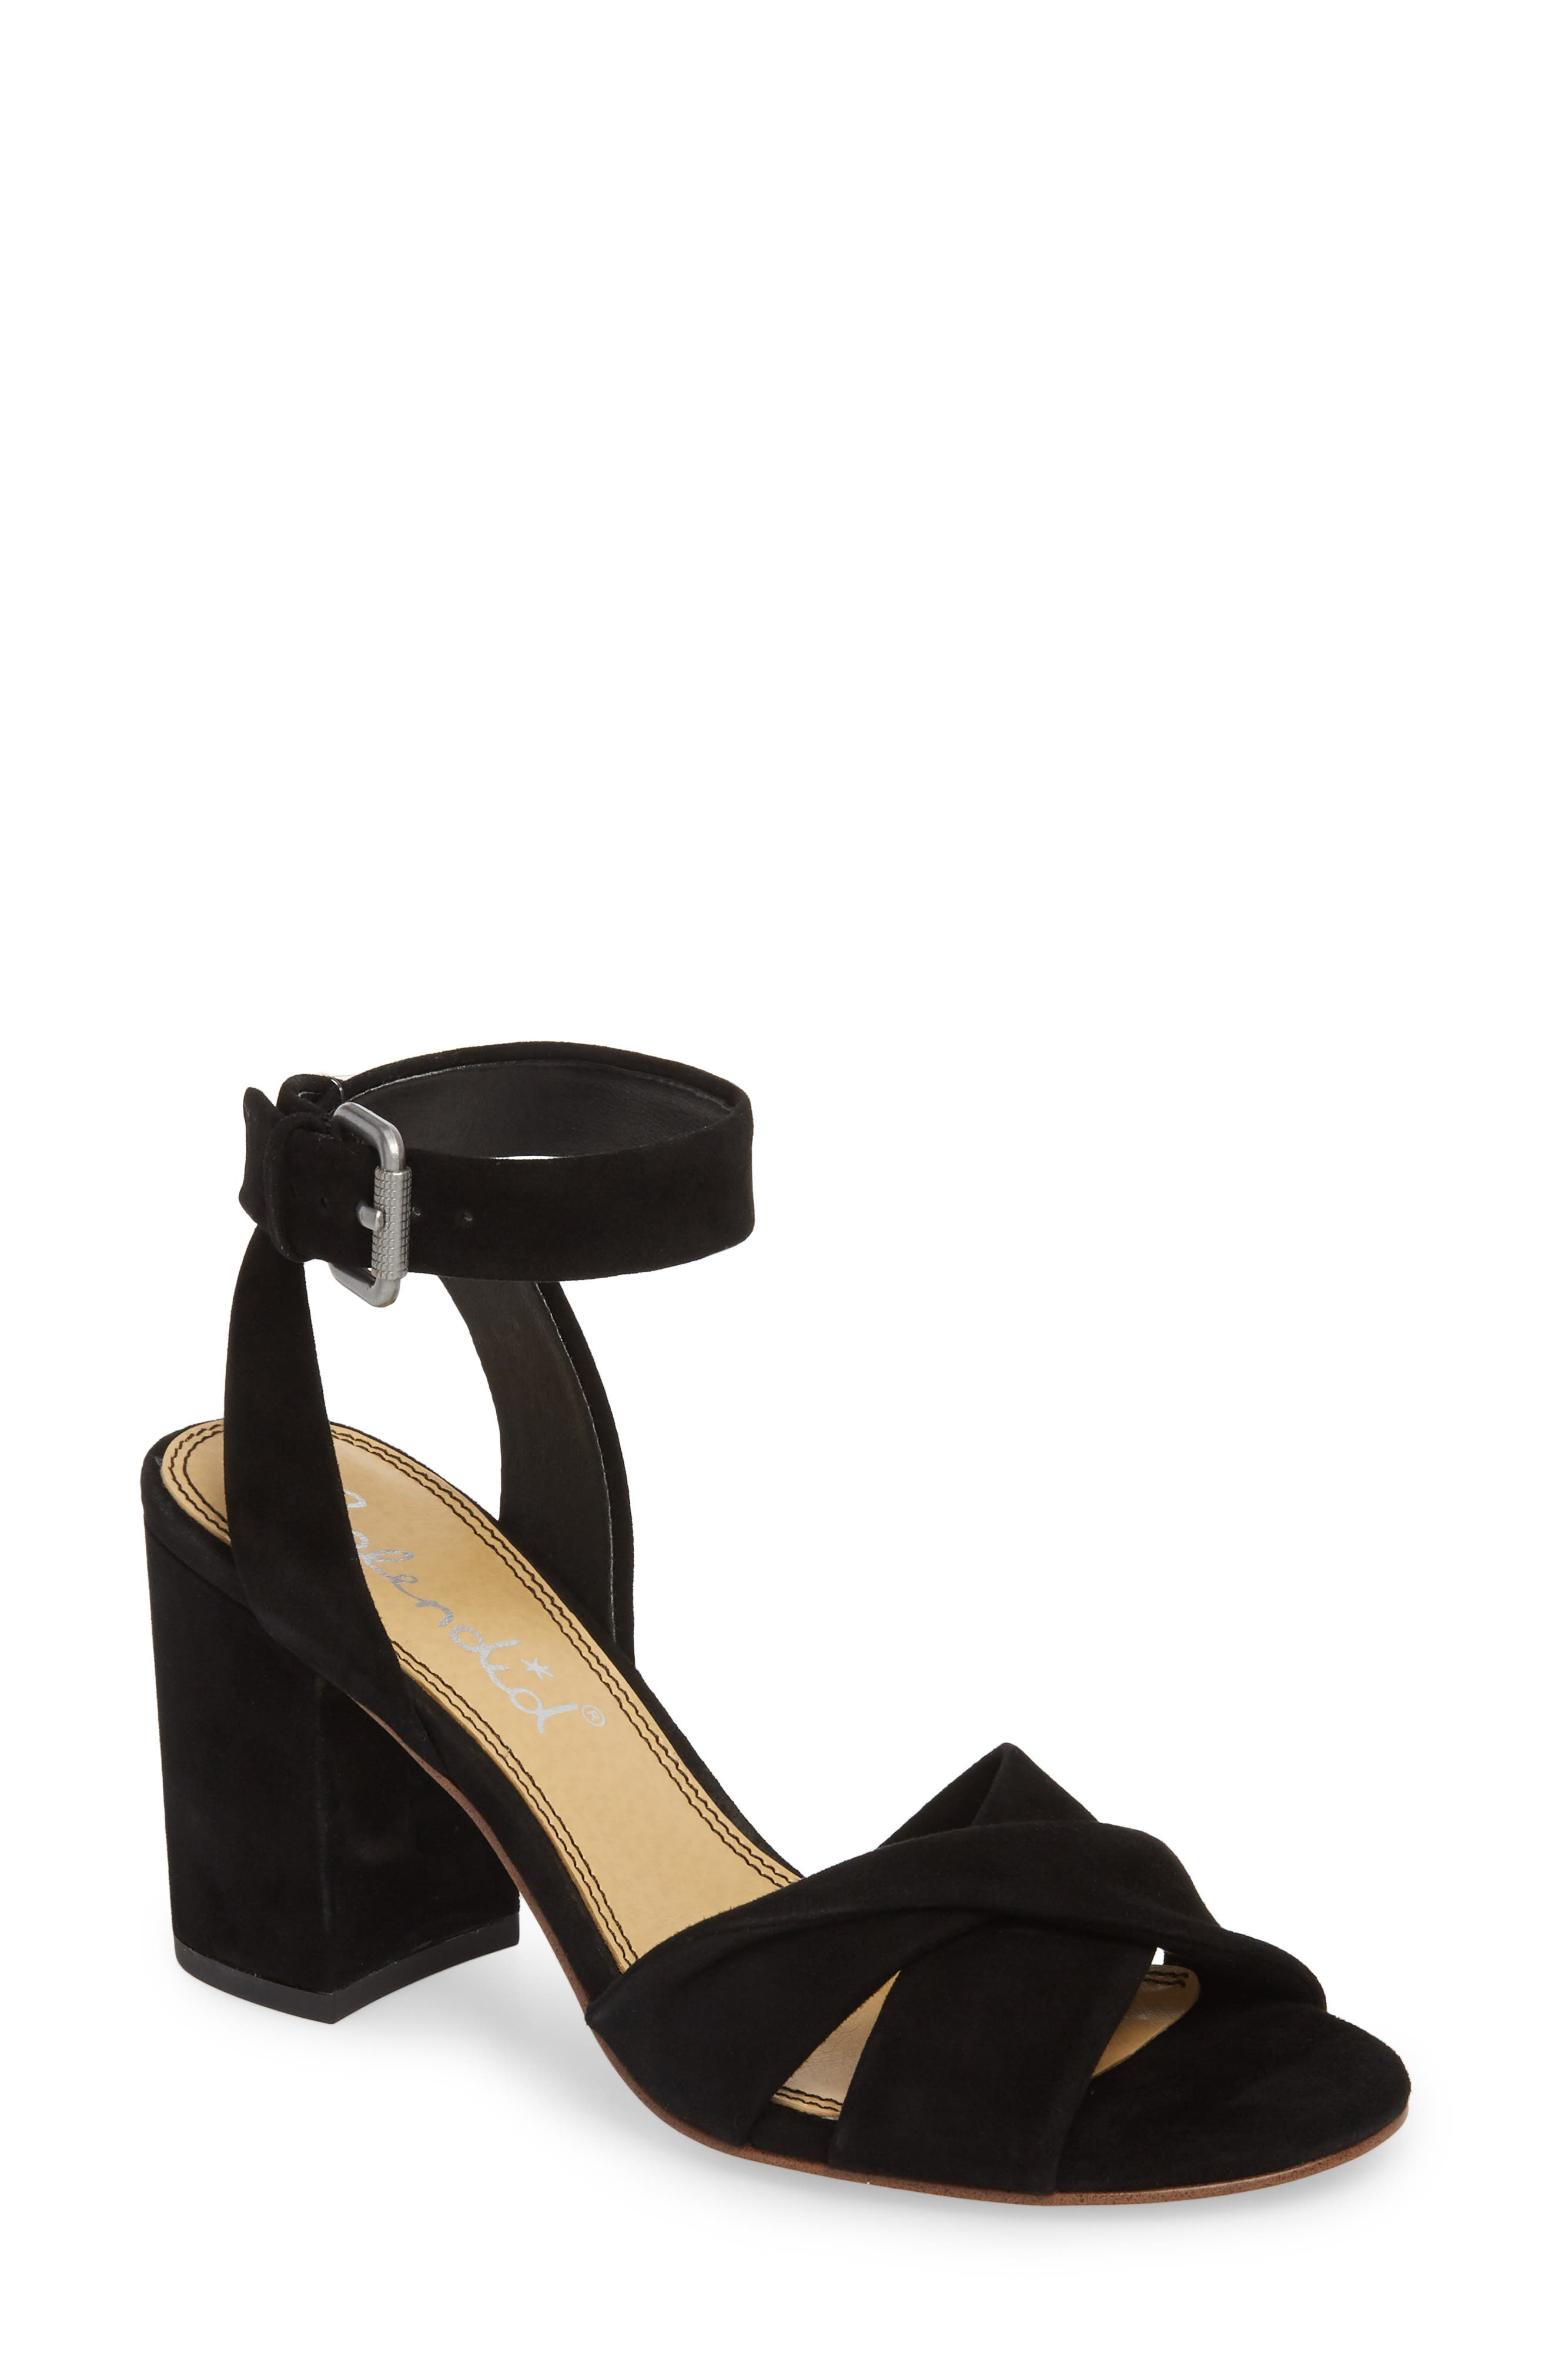 Fairy Block Heel Sandal,                         Main,                         color, Black Suede